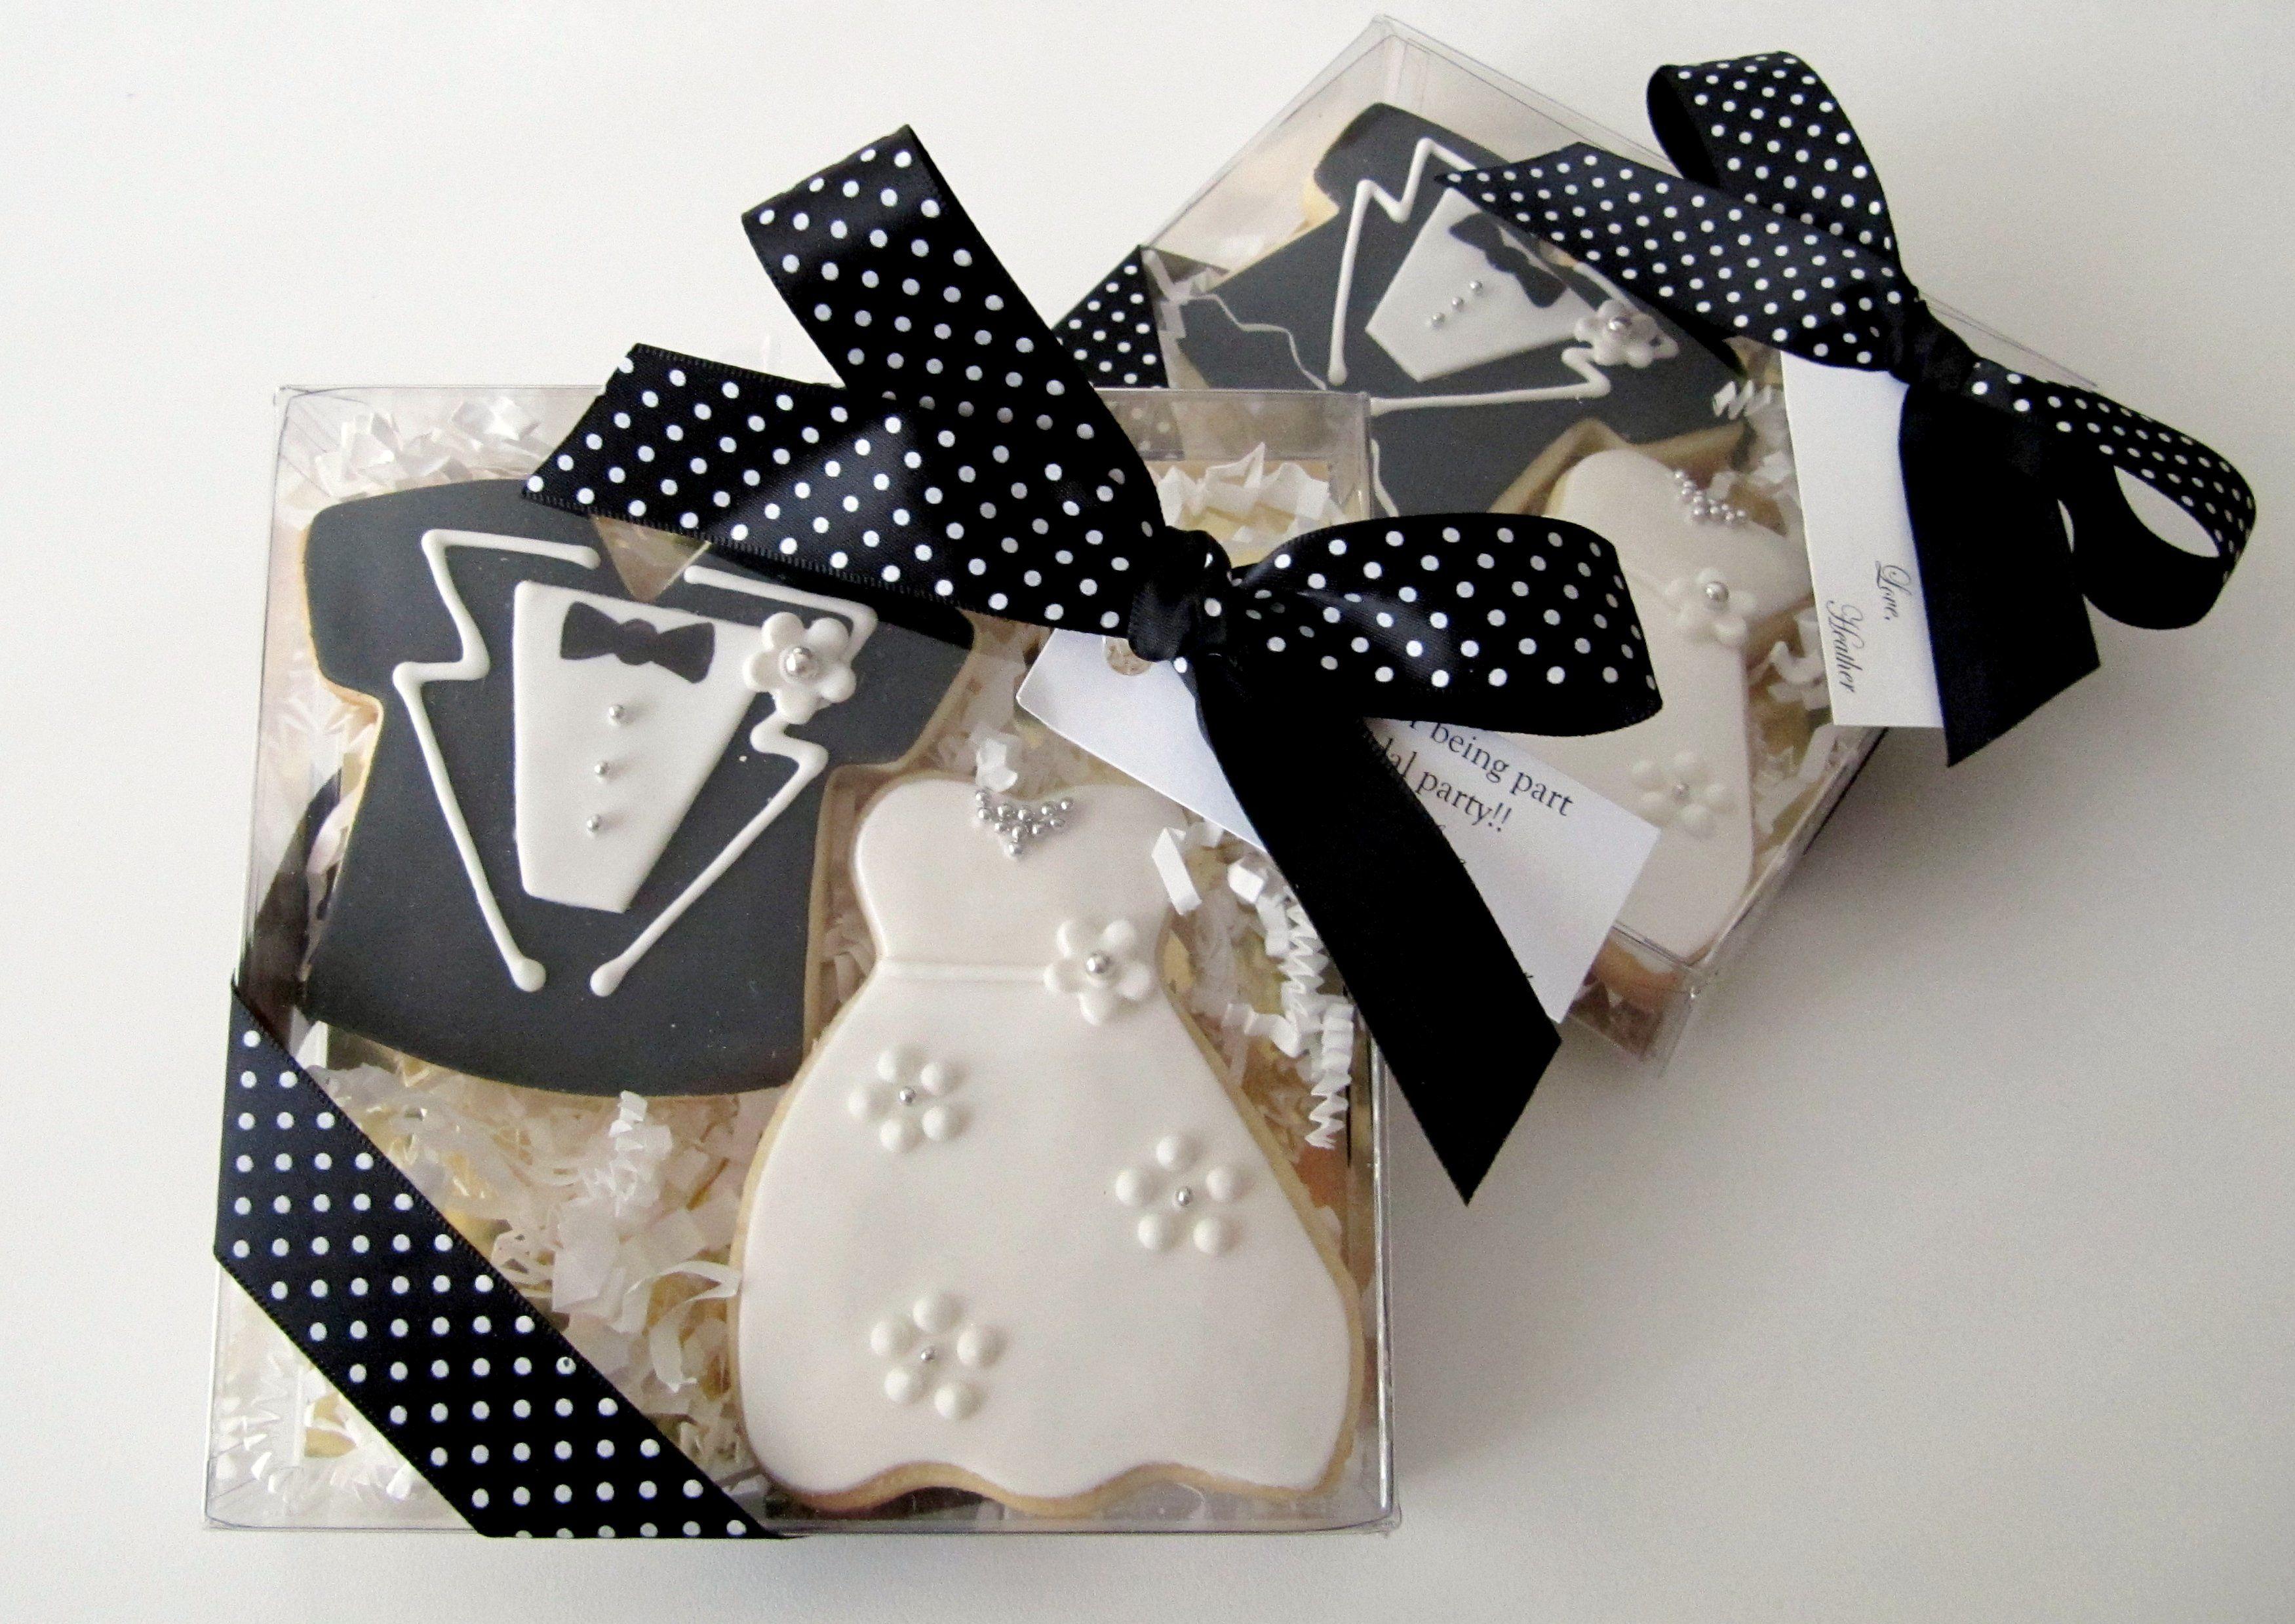 LV Sweets - wedding-favors-cookies-wedding-wedding-blog | Creative ...